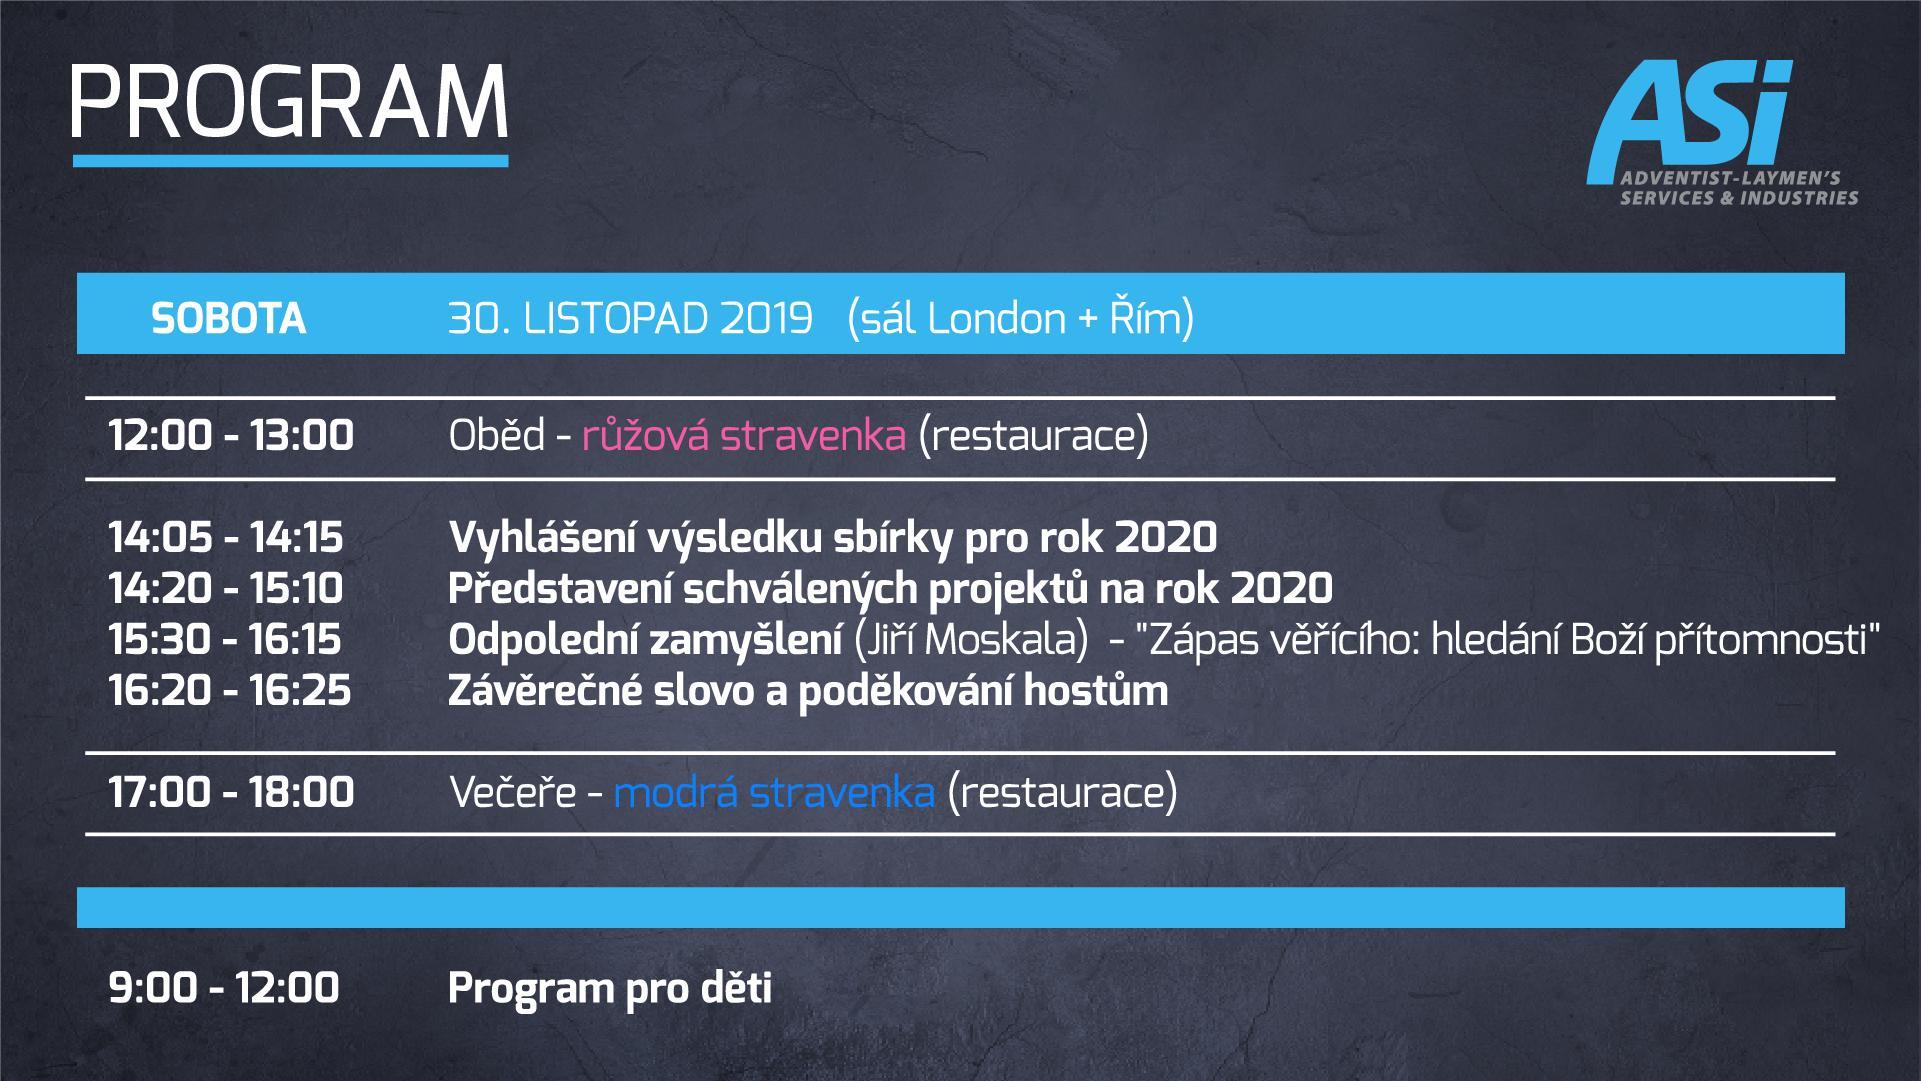 Program ASI Bratislava 5